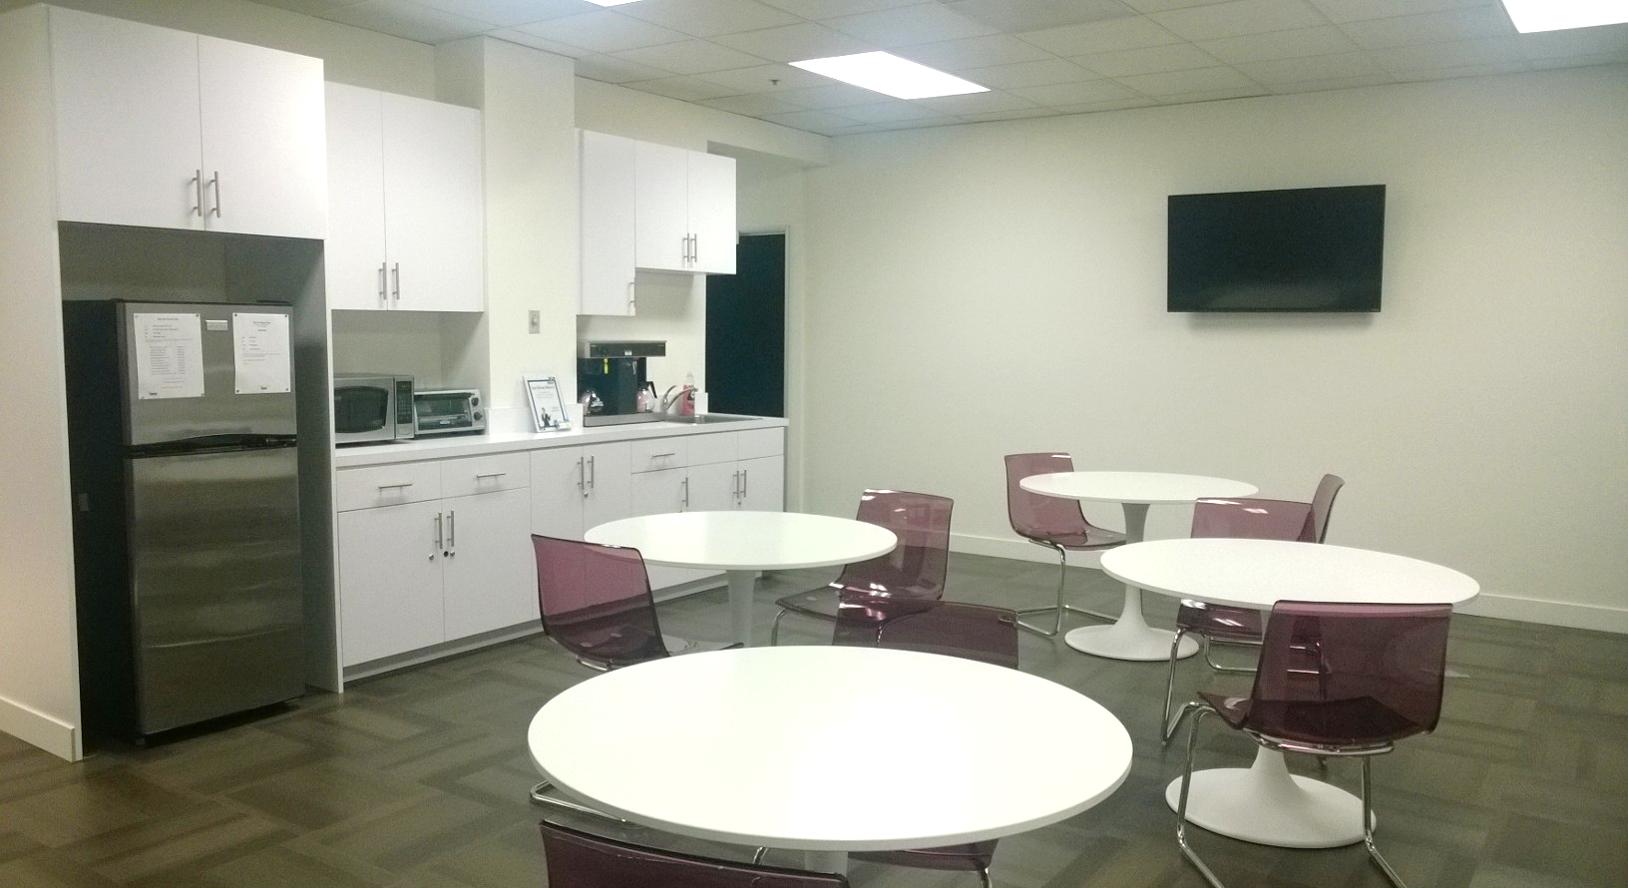 Break Area in La Mirada Virtual Office Space